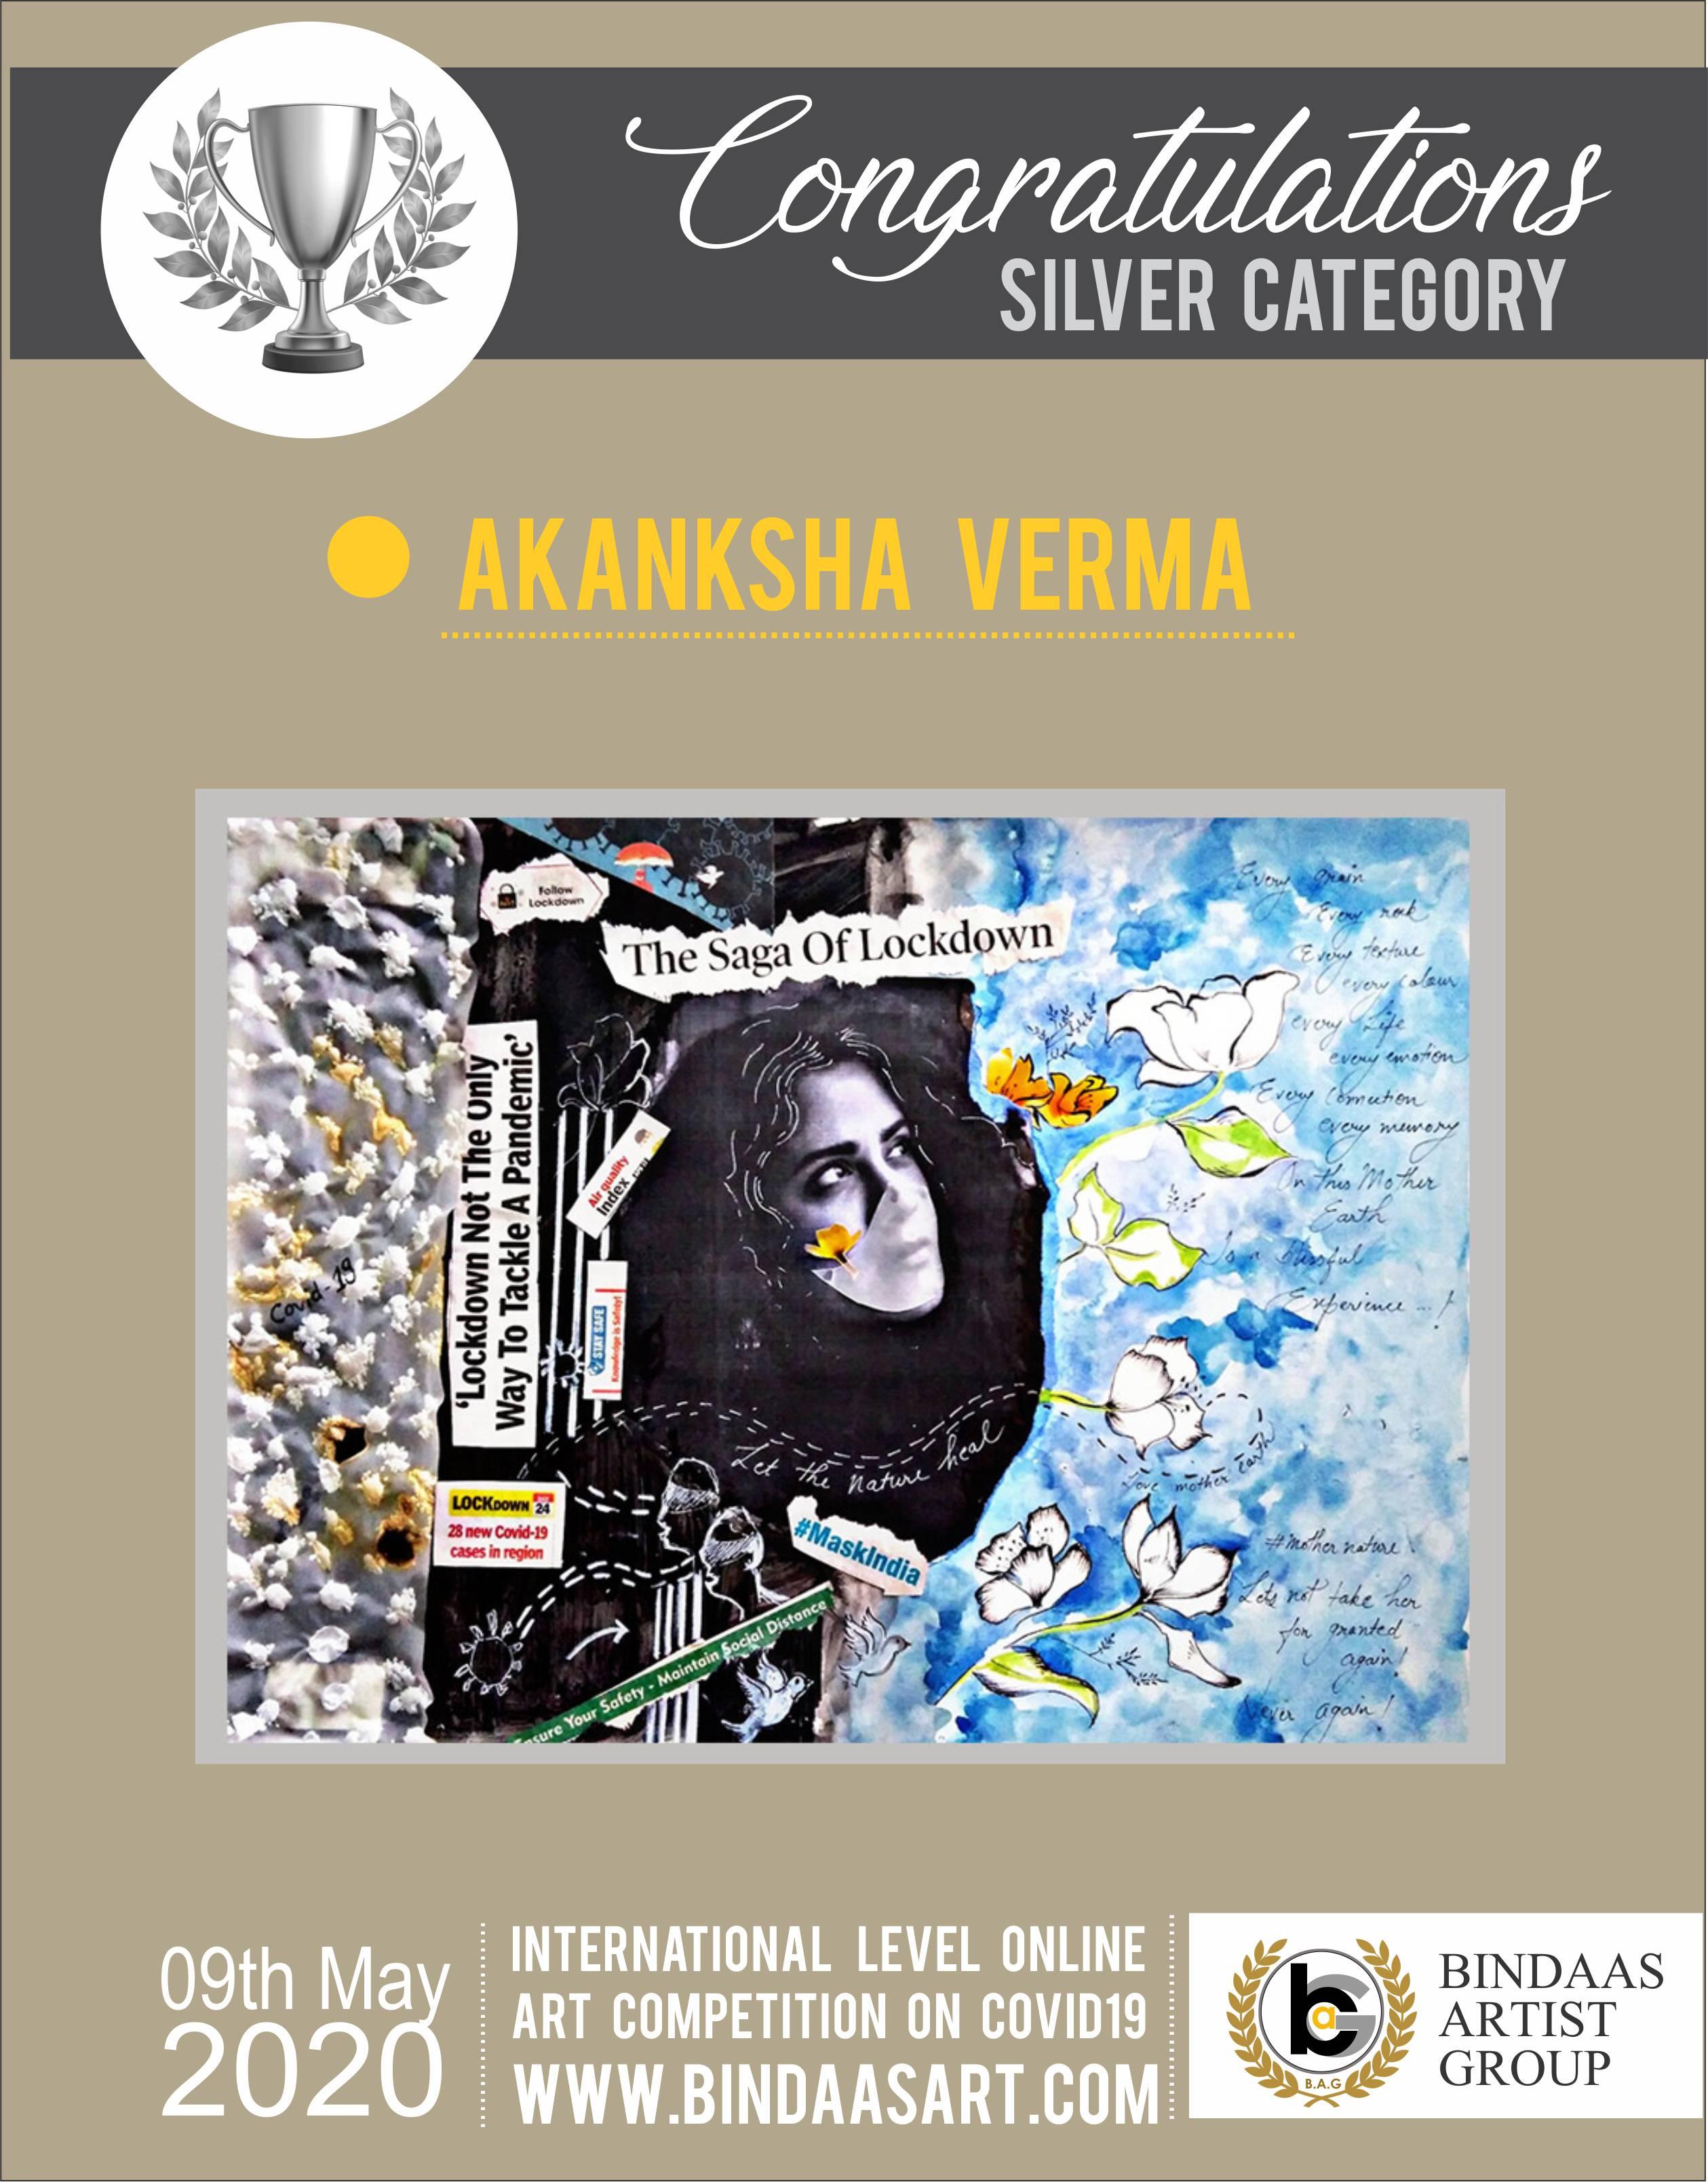 Akanksha Verma